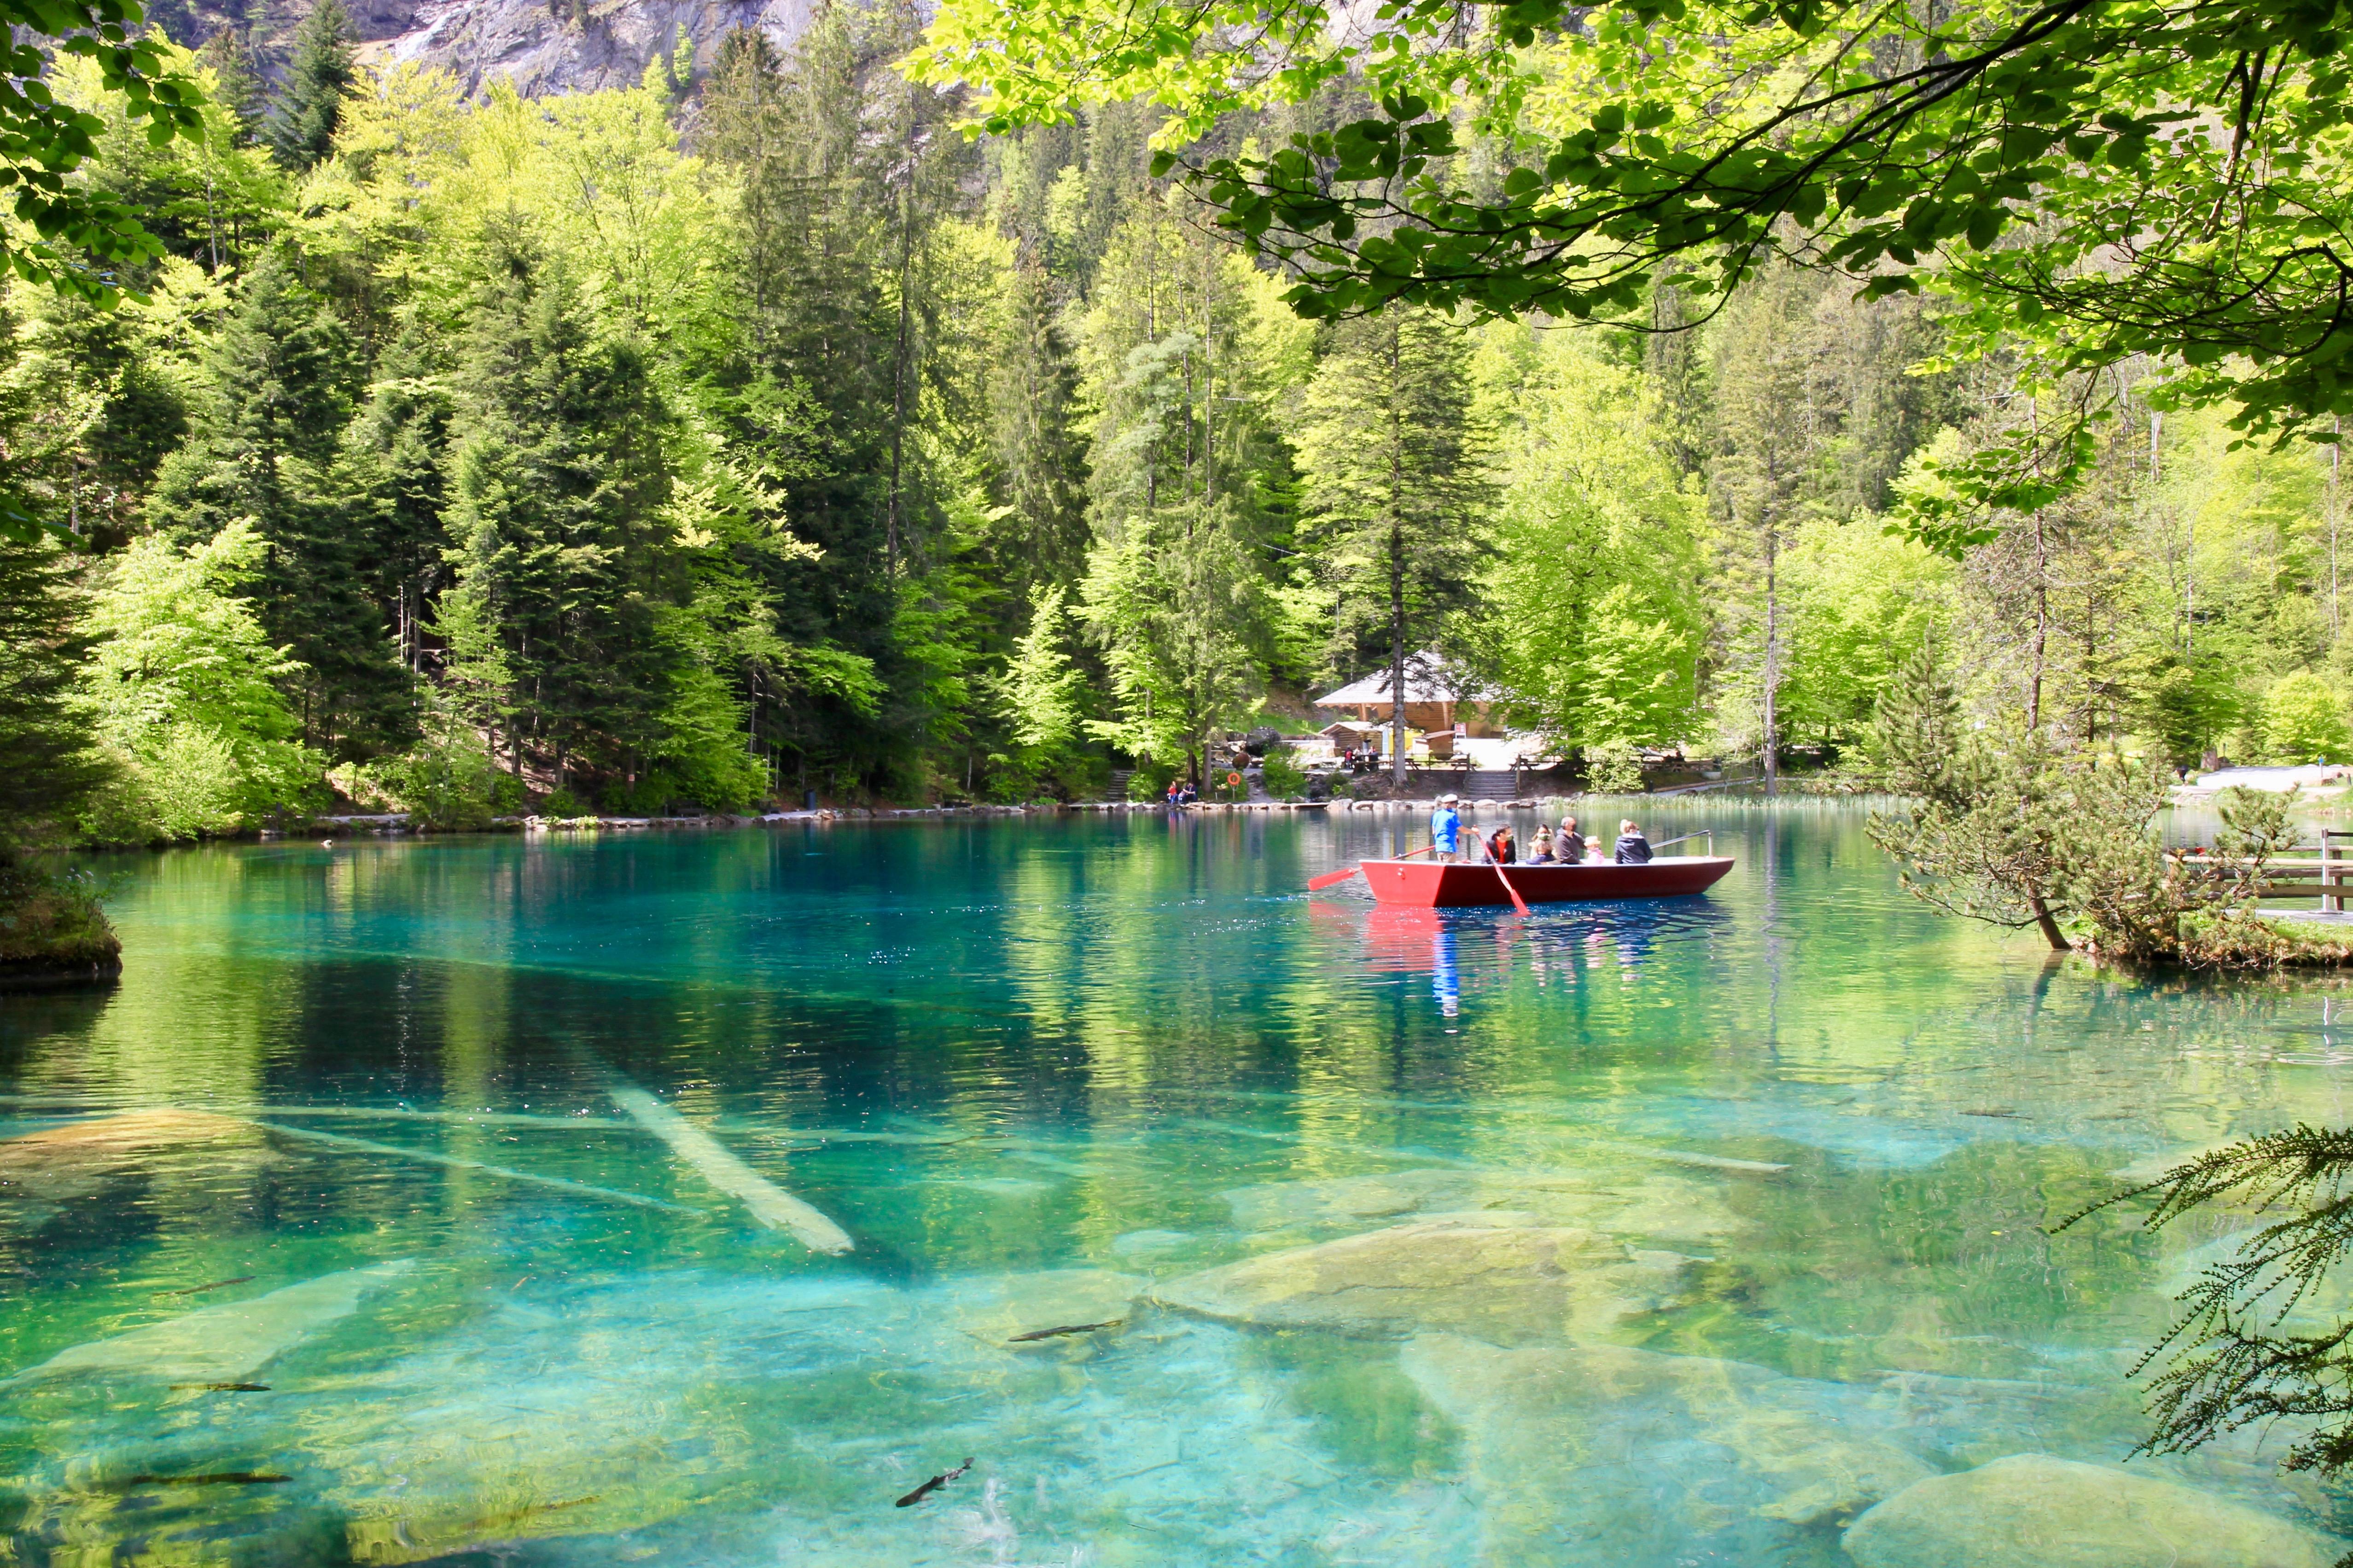 Lago blu - Blausee